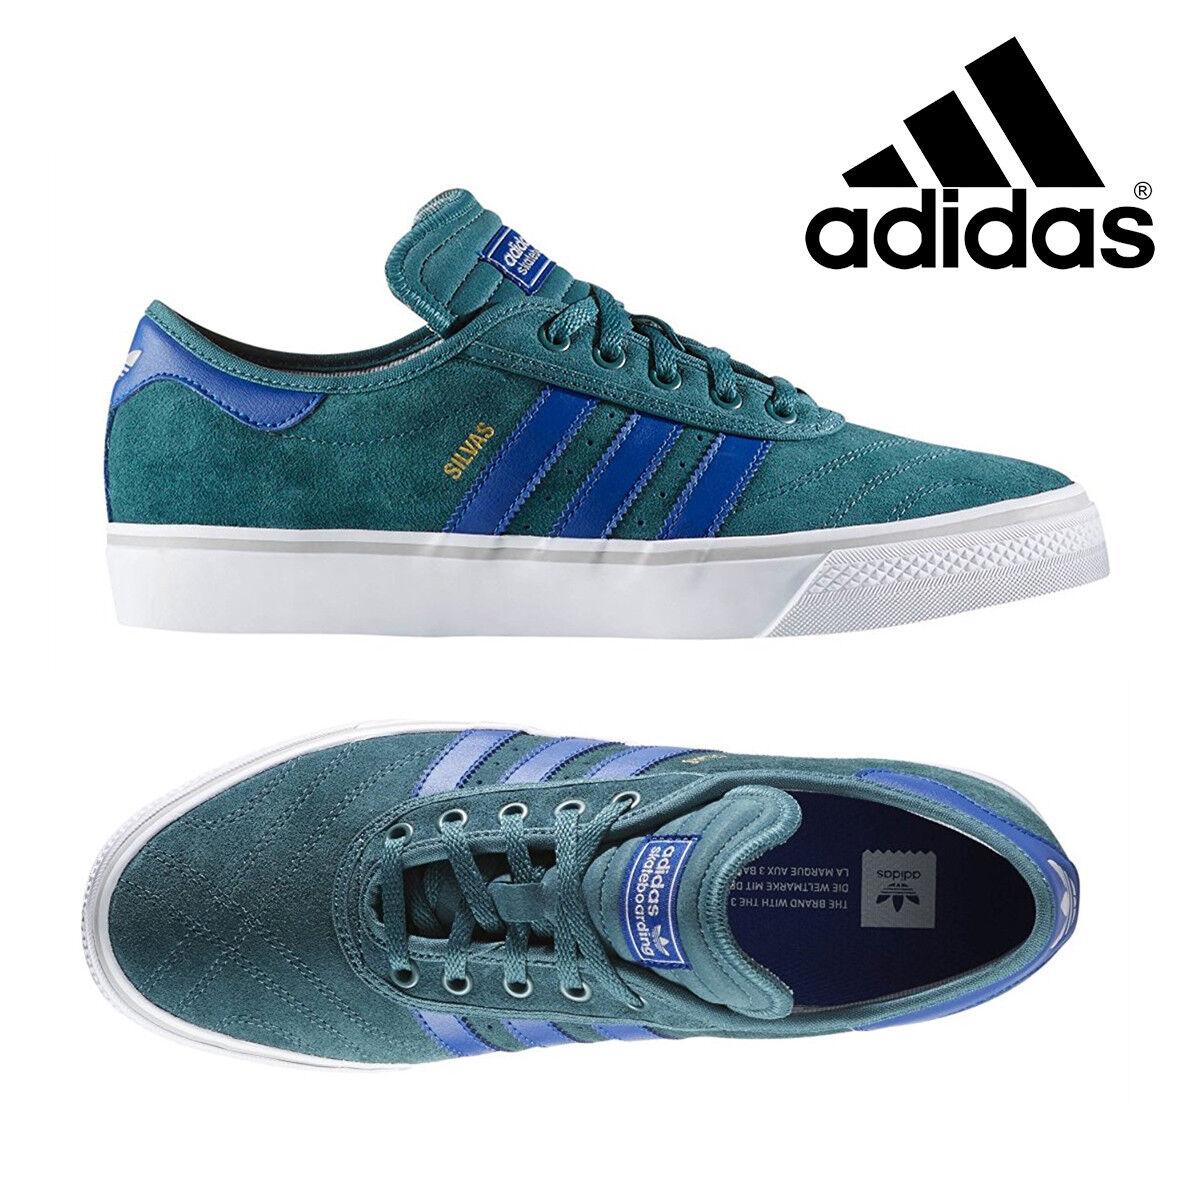 Adidas ADI EASE PREMIERE ADV Tech Green Collegiate Royal Sneakers BB8502 NEW